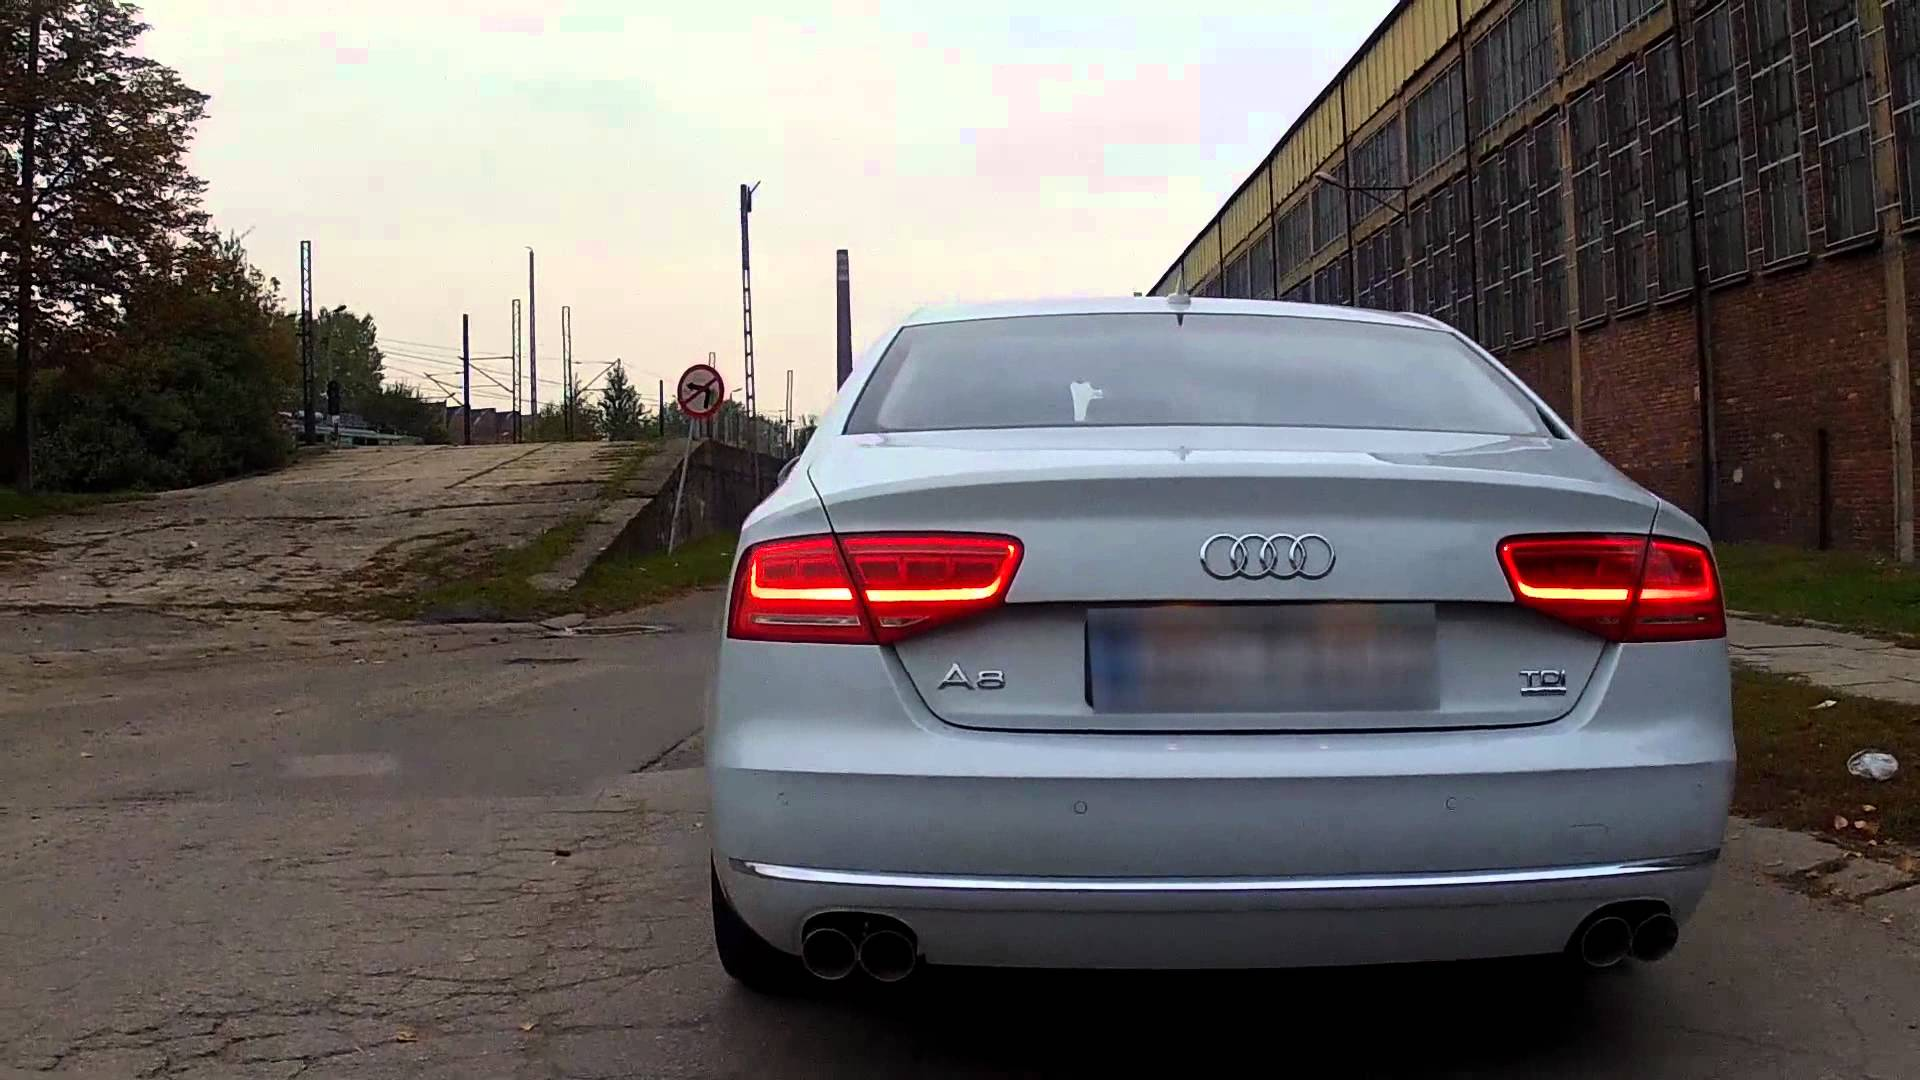 Audi A8 (D5) Wallpapers